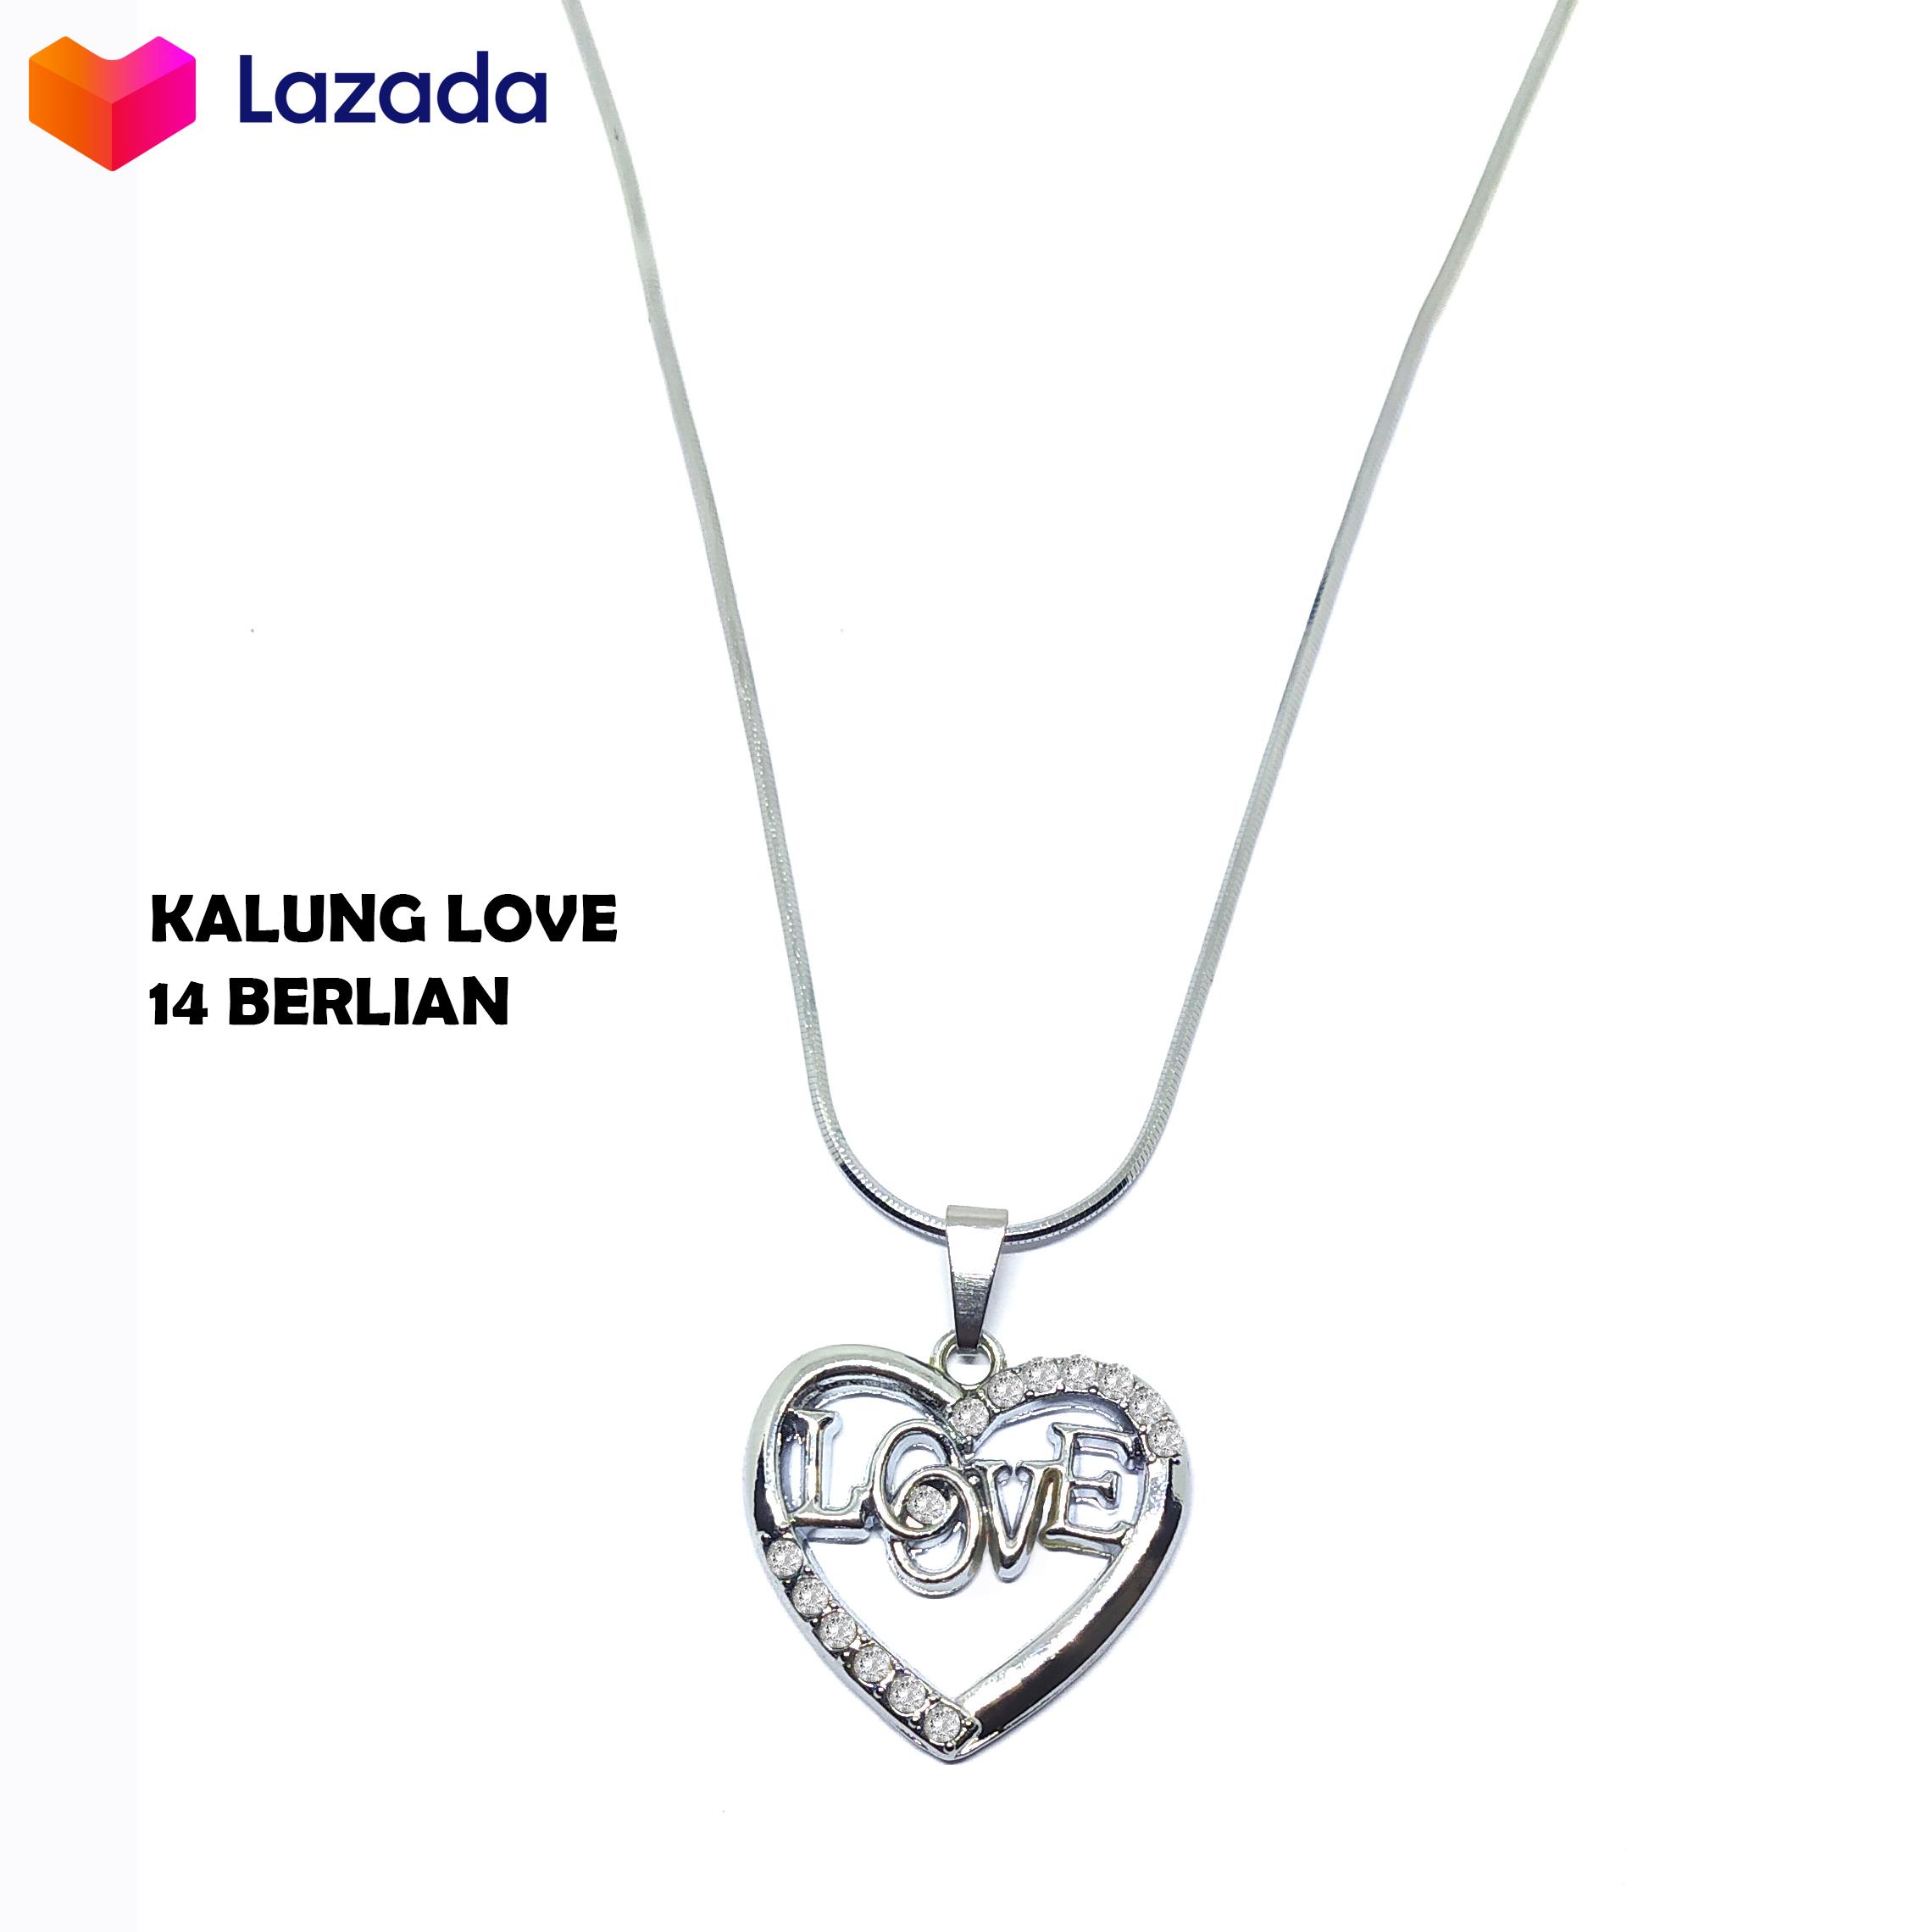 kalung titanium anti karat berlian cinta tulisan love perhiasan wanita atau kalung wanita korea | kalung wanita  2020 | kalung titanium anti karat model  | perhiasan titanium asli anti luntur | kalung rantai wanita | kalung putih anti karat